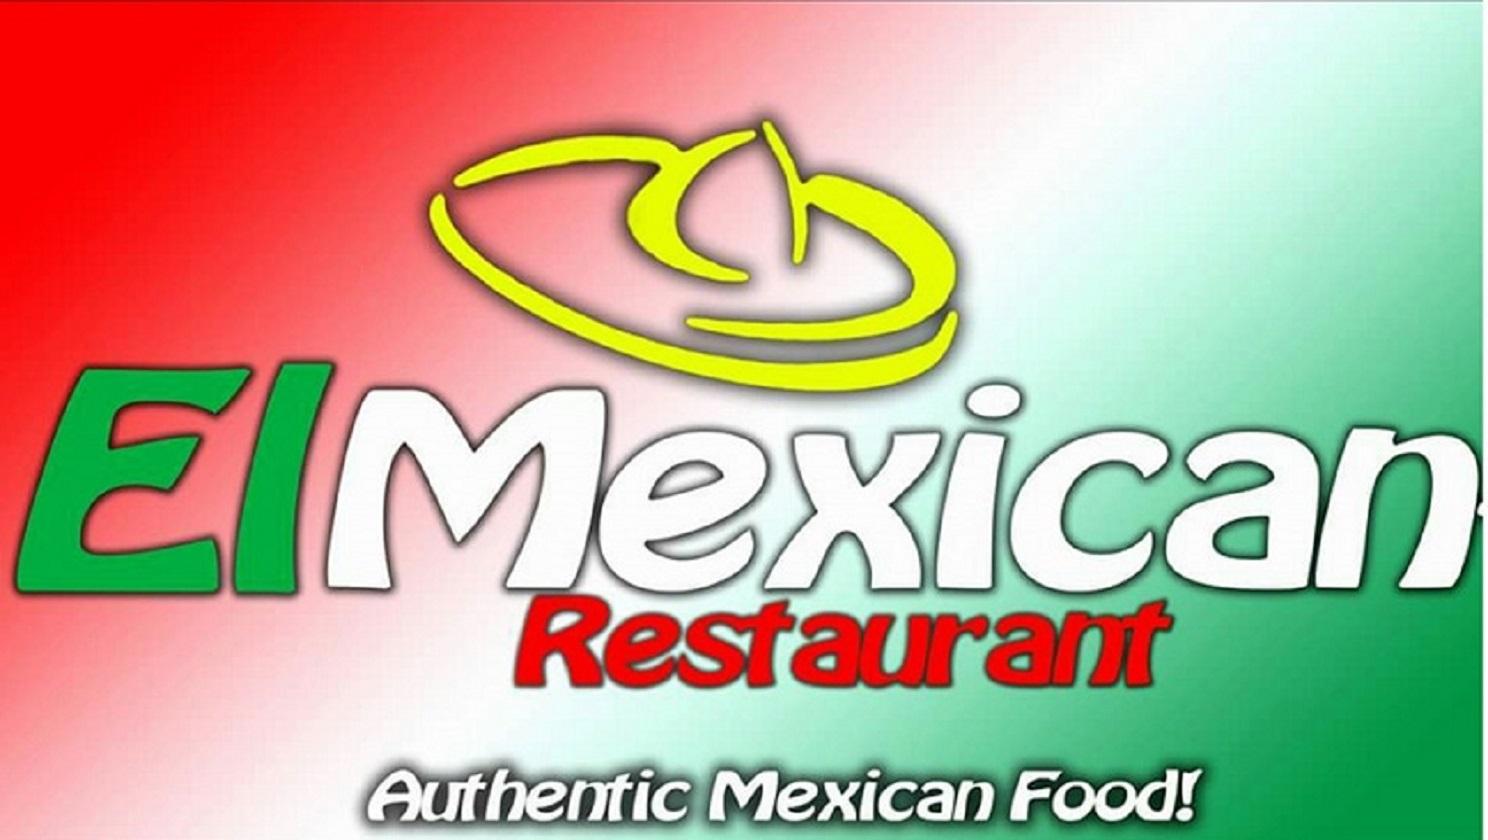 El-Mexican-Restaurant.jpg